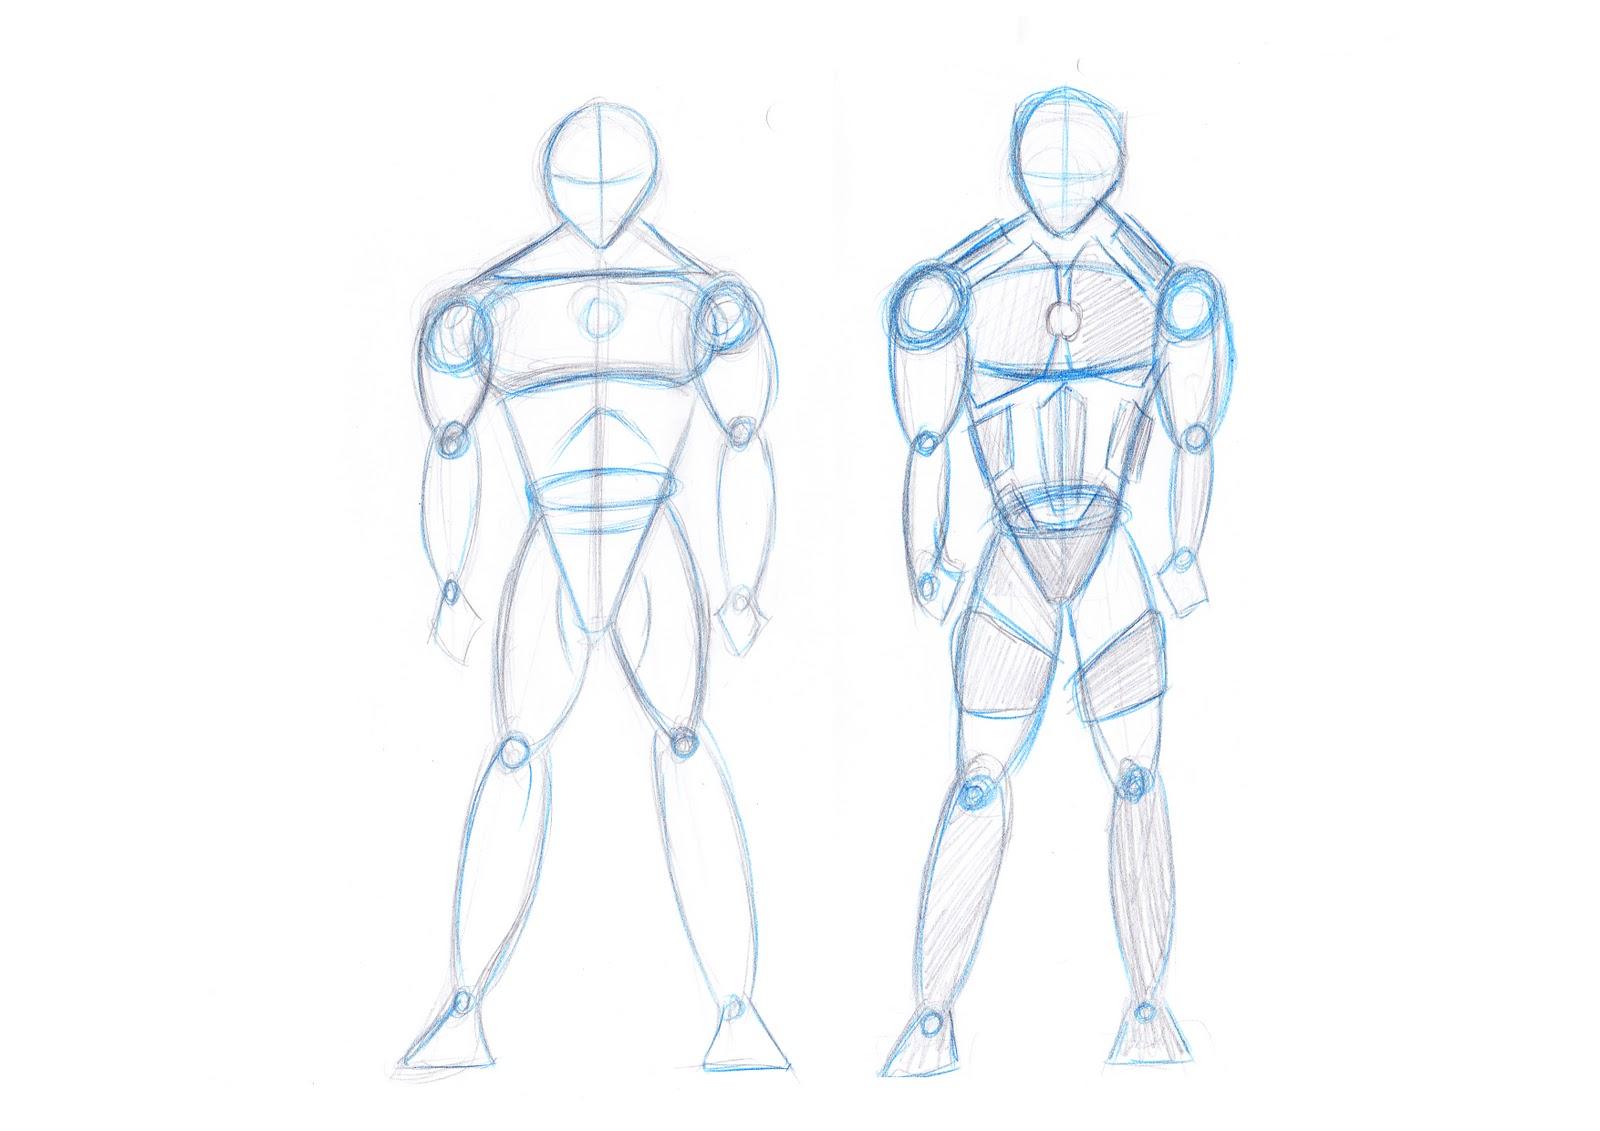 Character Design With Basic Shapes : Alpha omega character design cipher emanio villian ninja